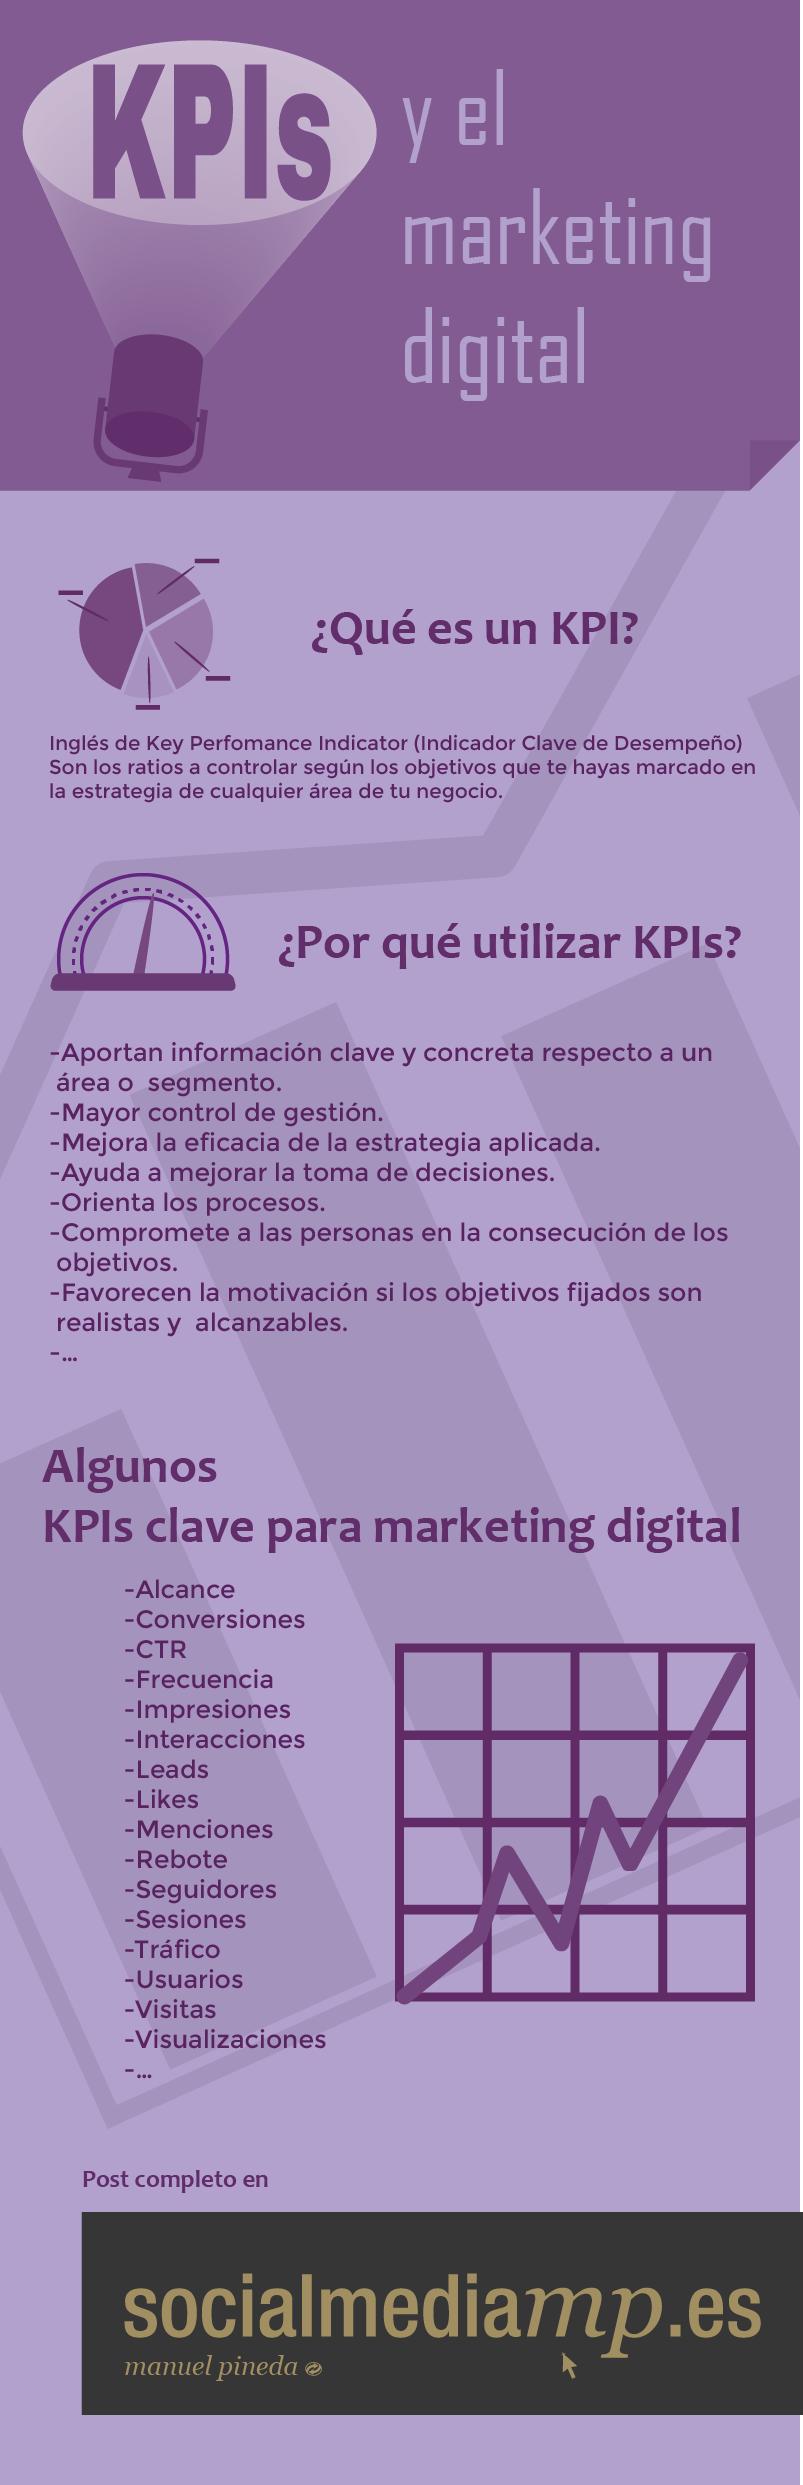 Infografia - KPIs y Marketing Digital #infografia #infographic #marketing - TICs y Formación